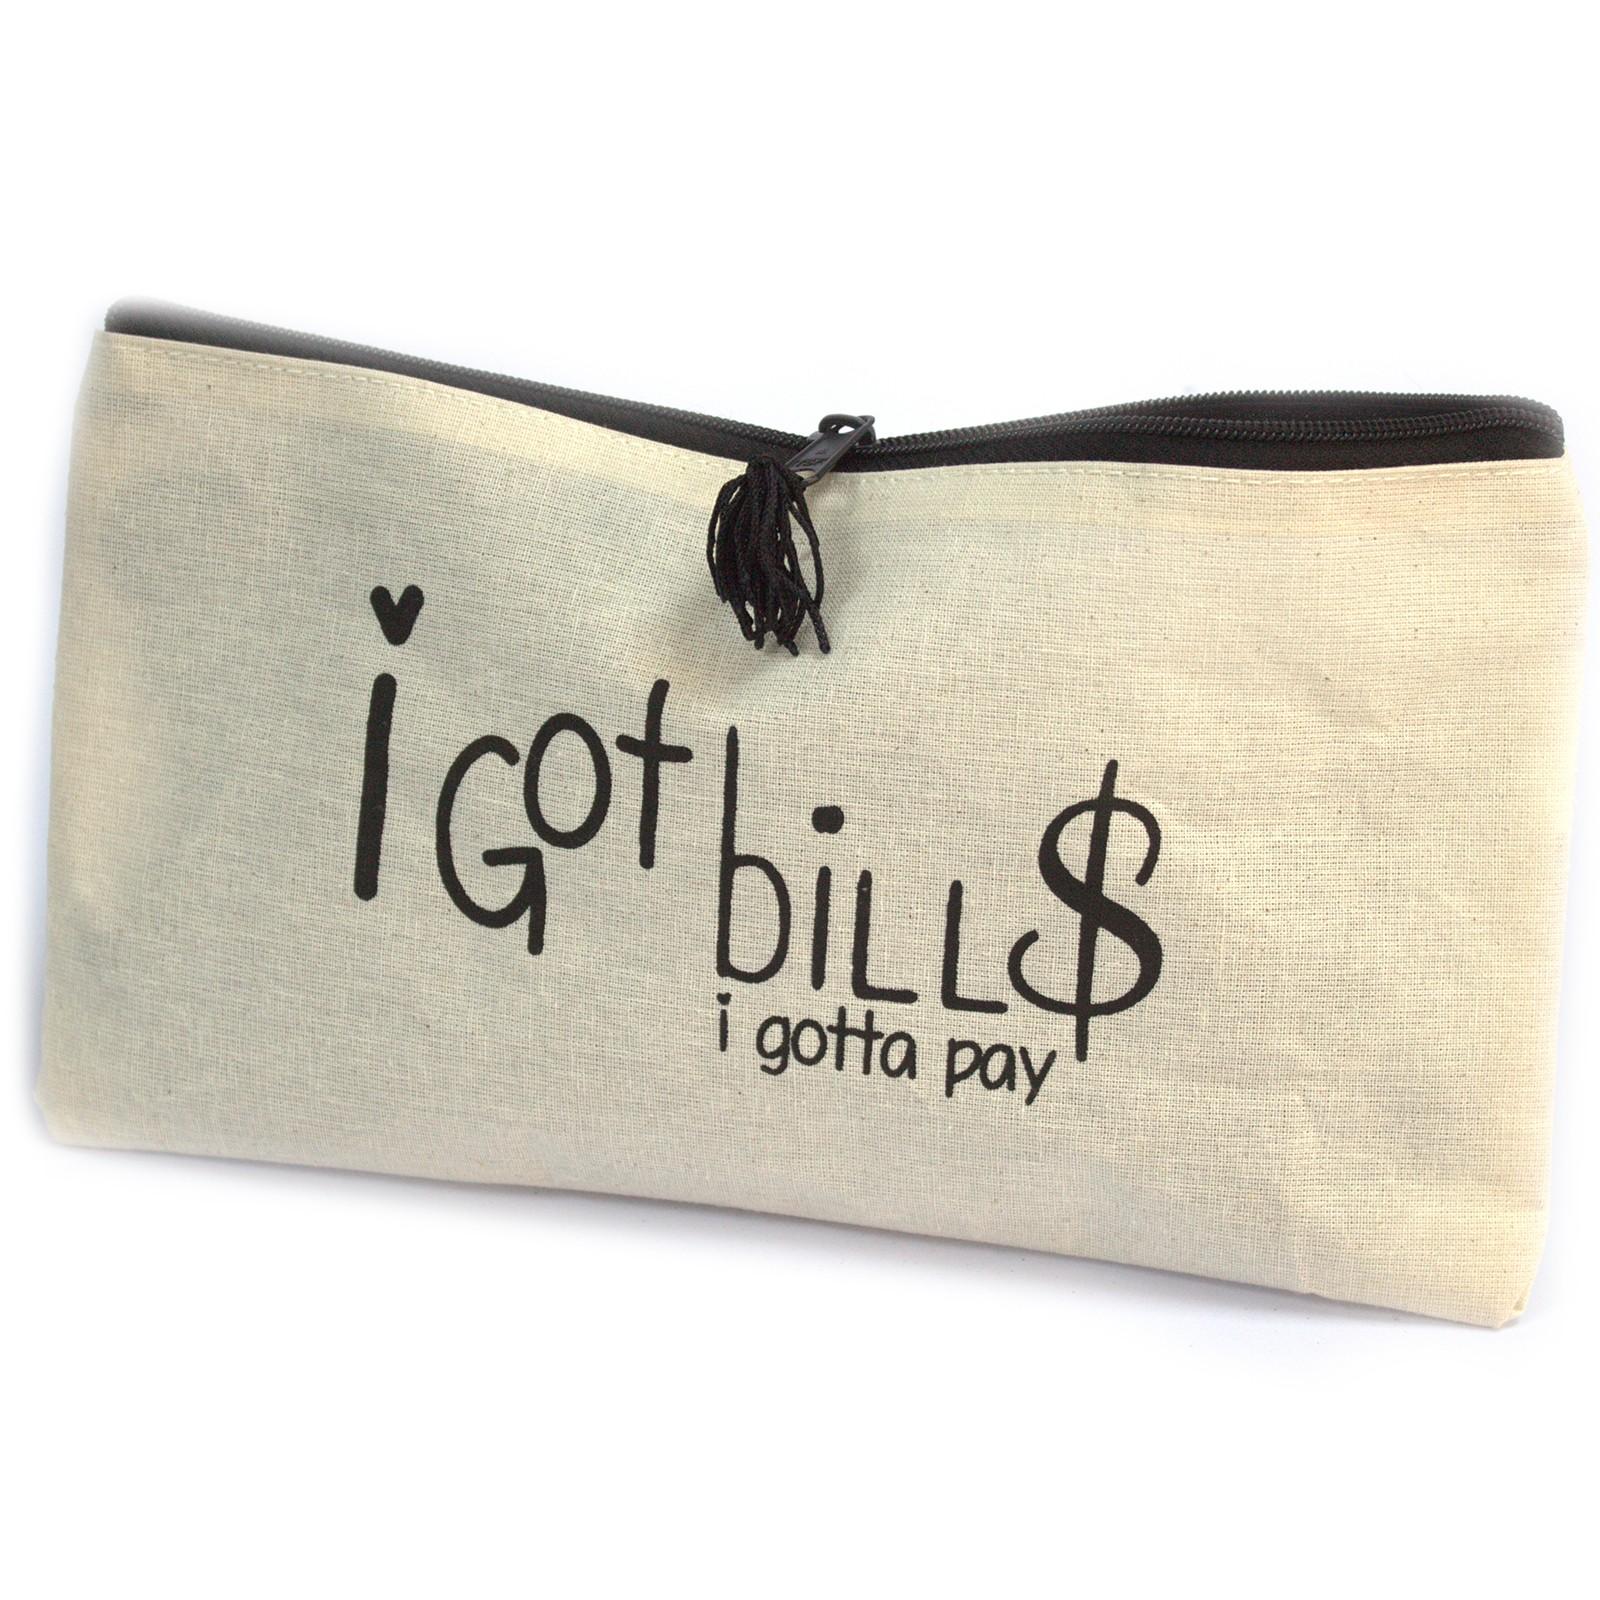 Get Organised Pouch I Got Bills I gotta pay